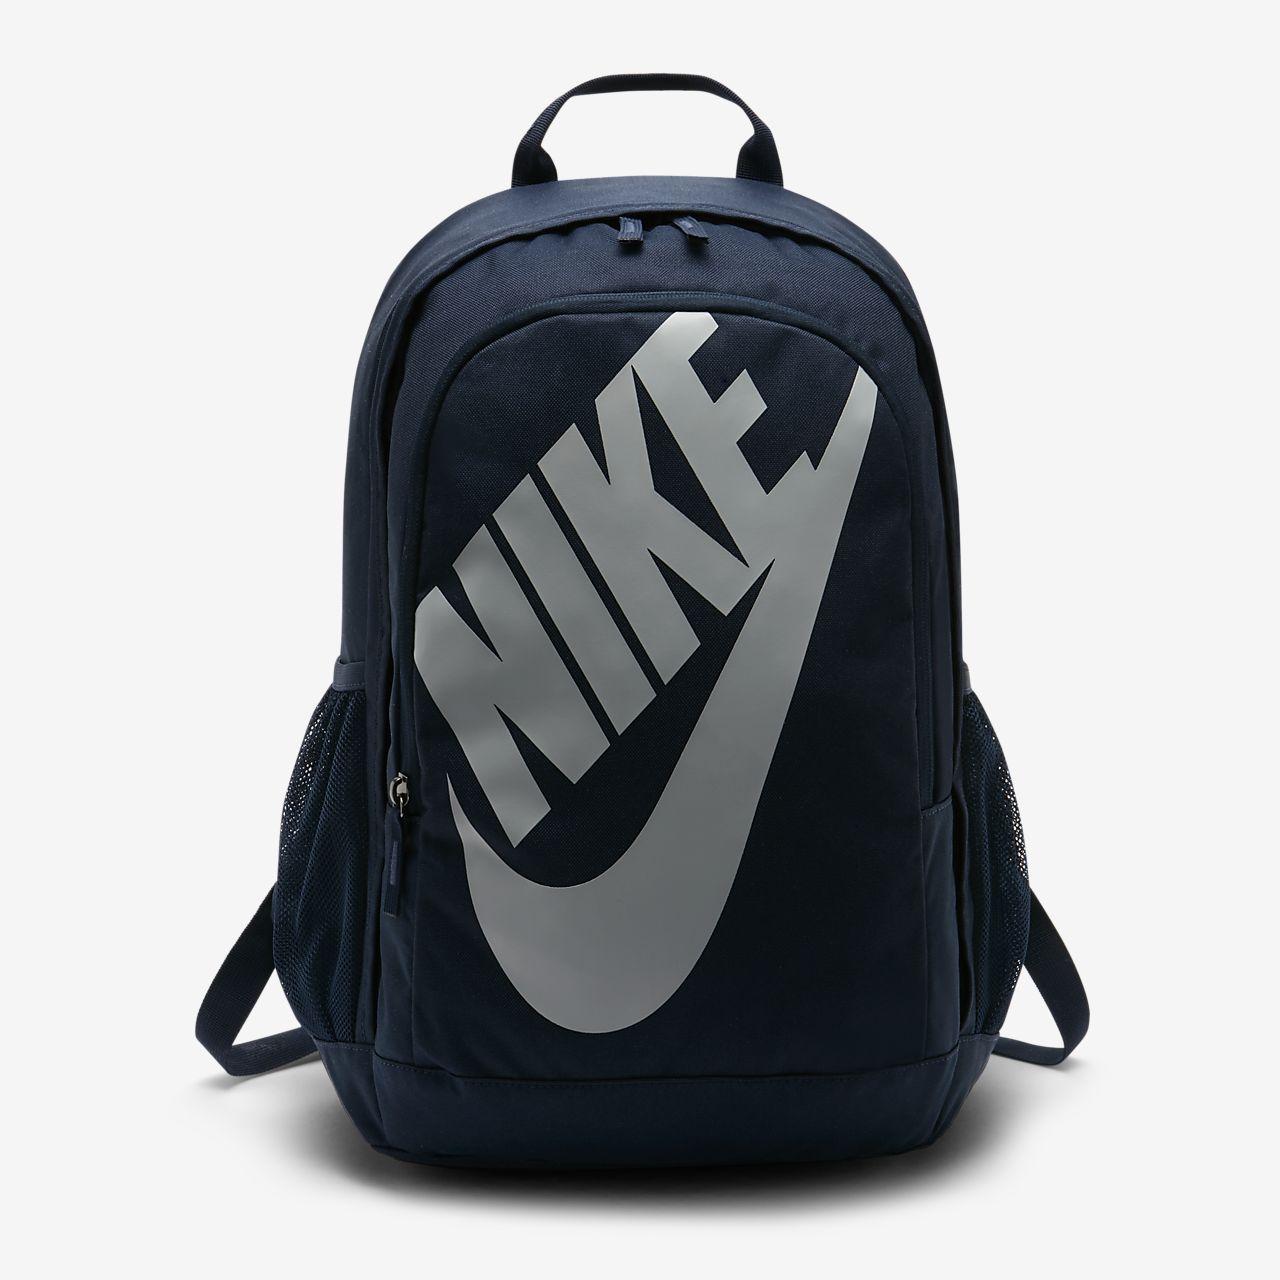 cbfb4366e6 Nike Sportswear Hayward Futura 2.0 Backpack. Nike.com LU